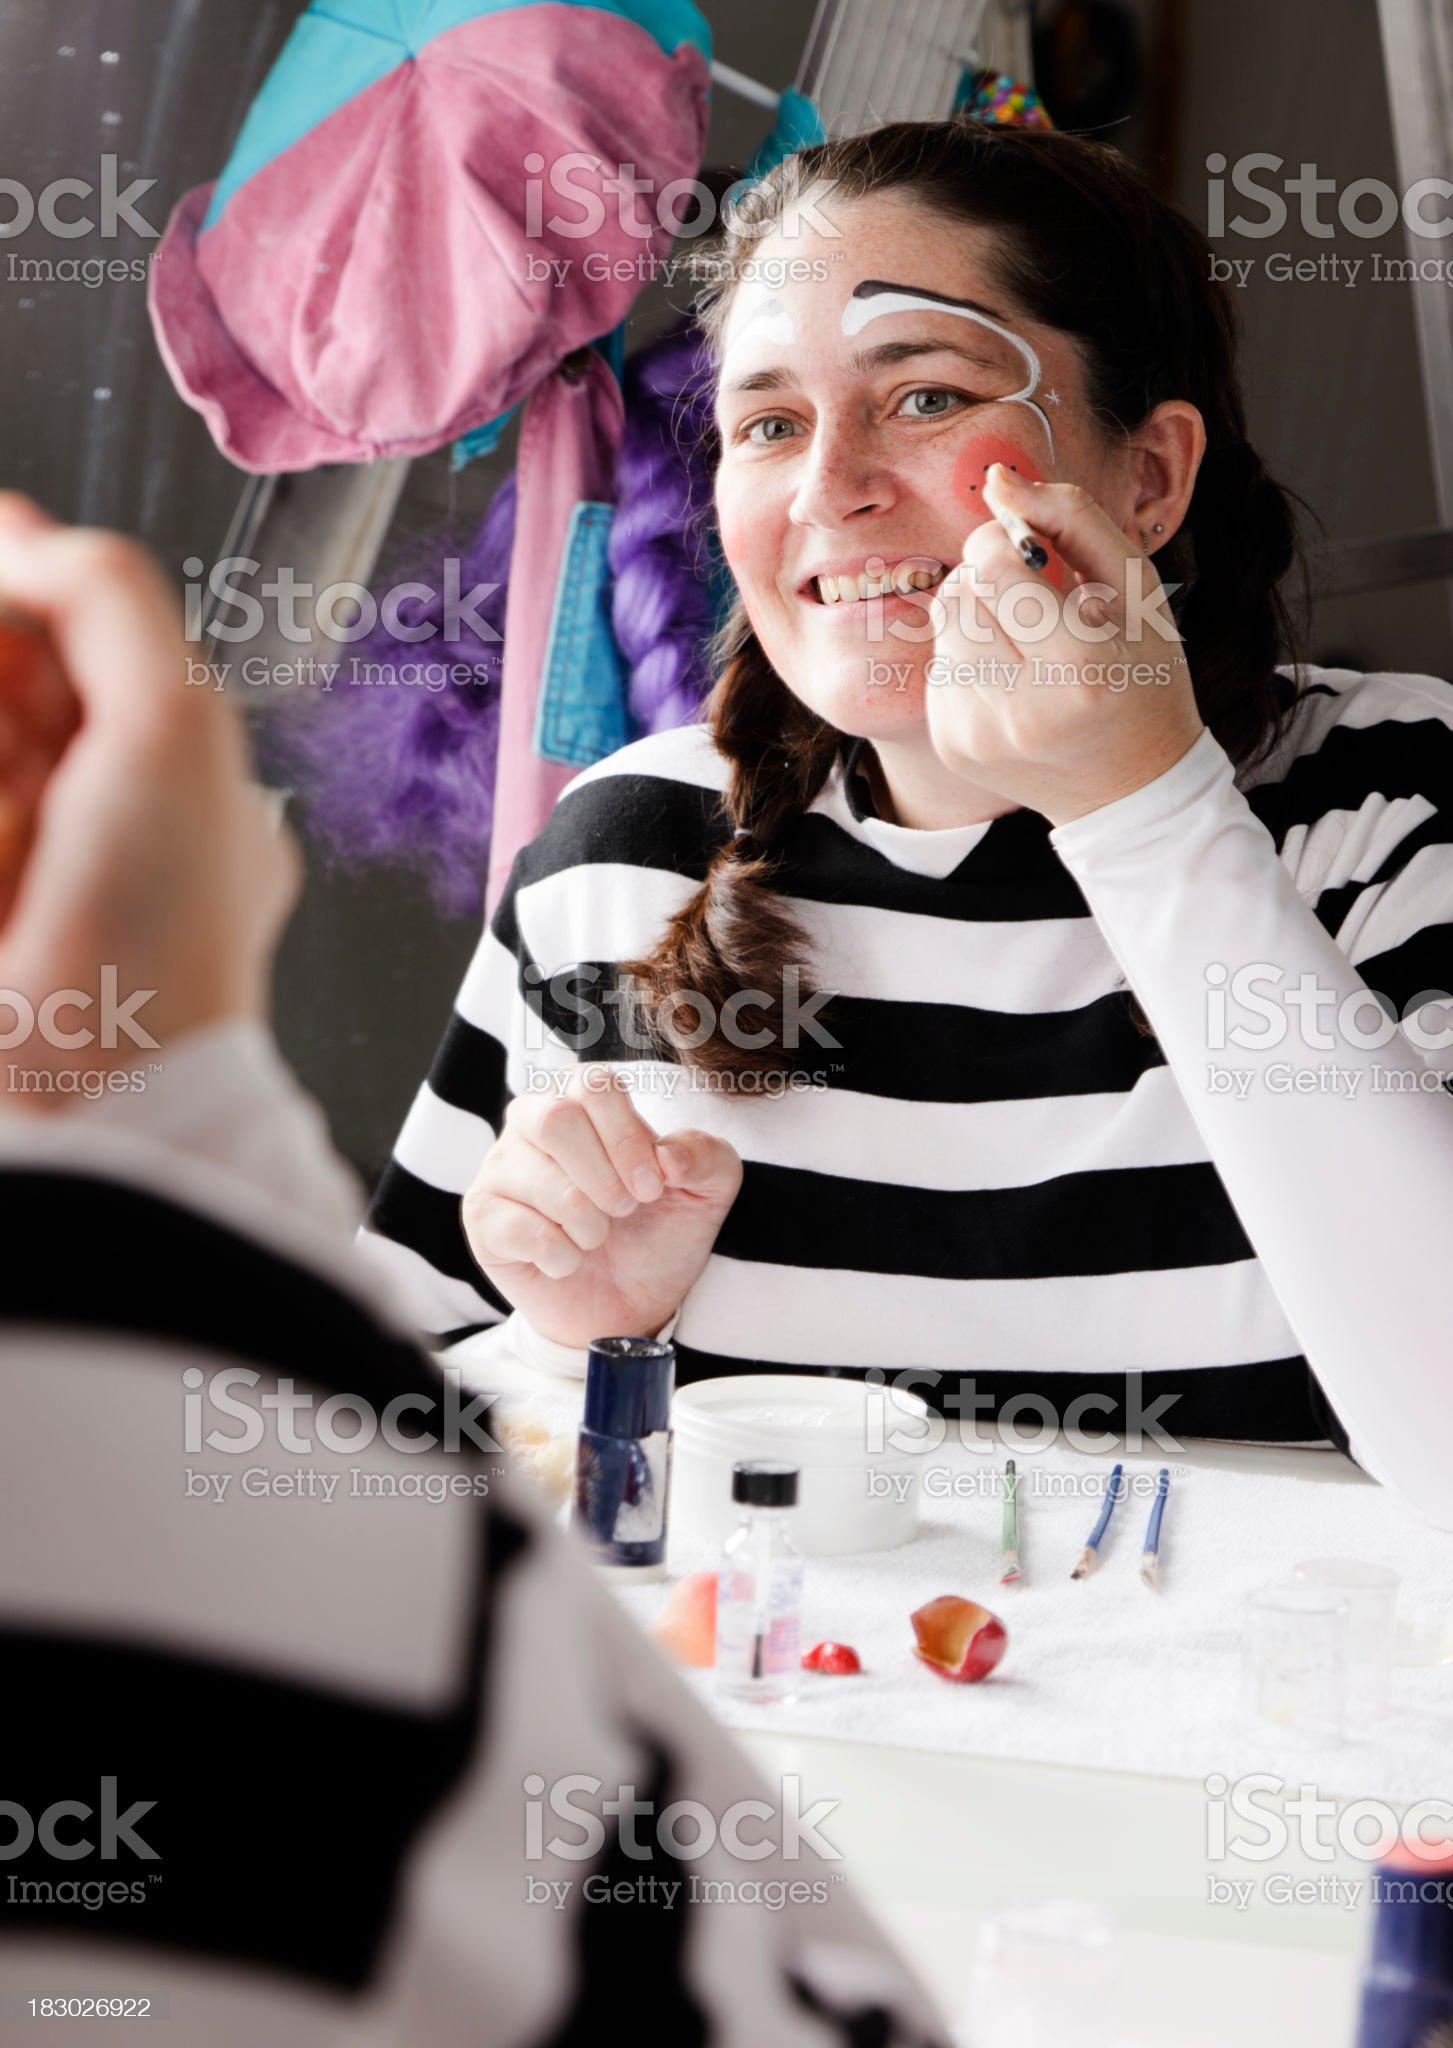 Woman Putting on Clown Makeup royalty-free stock photo